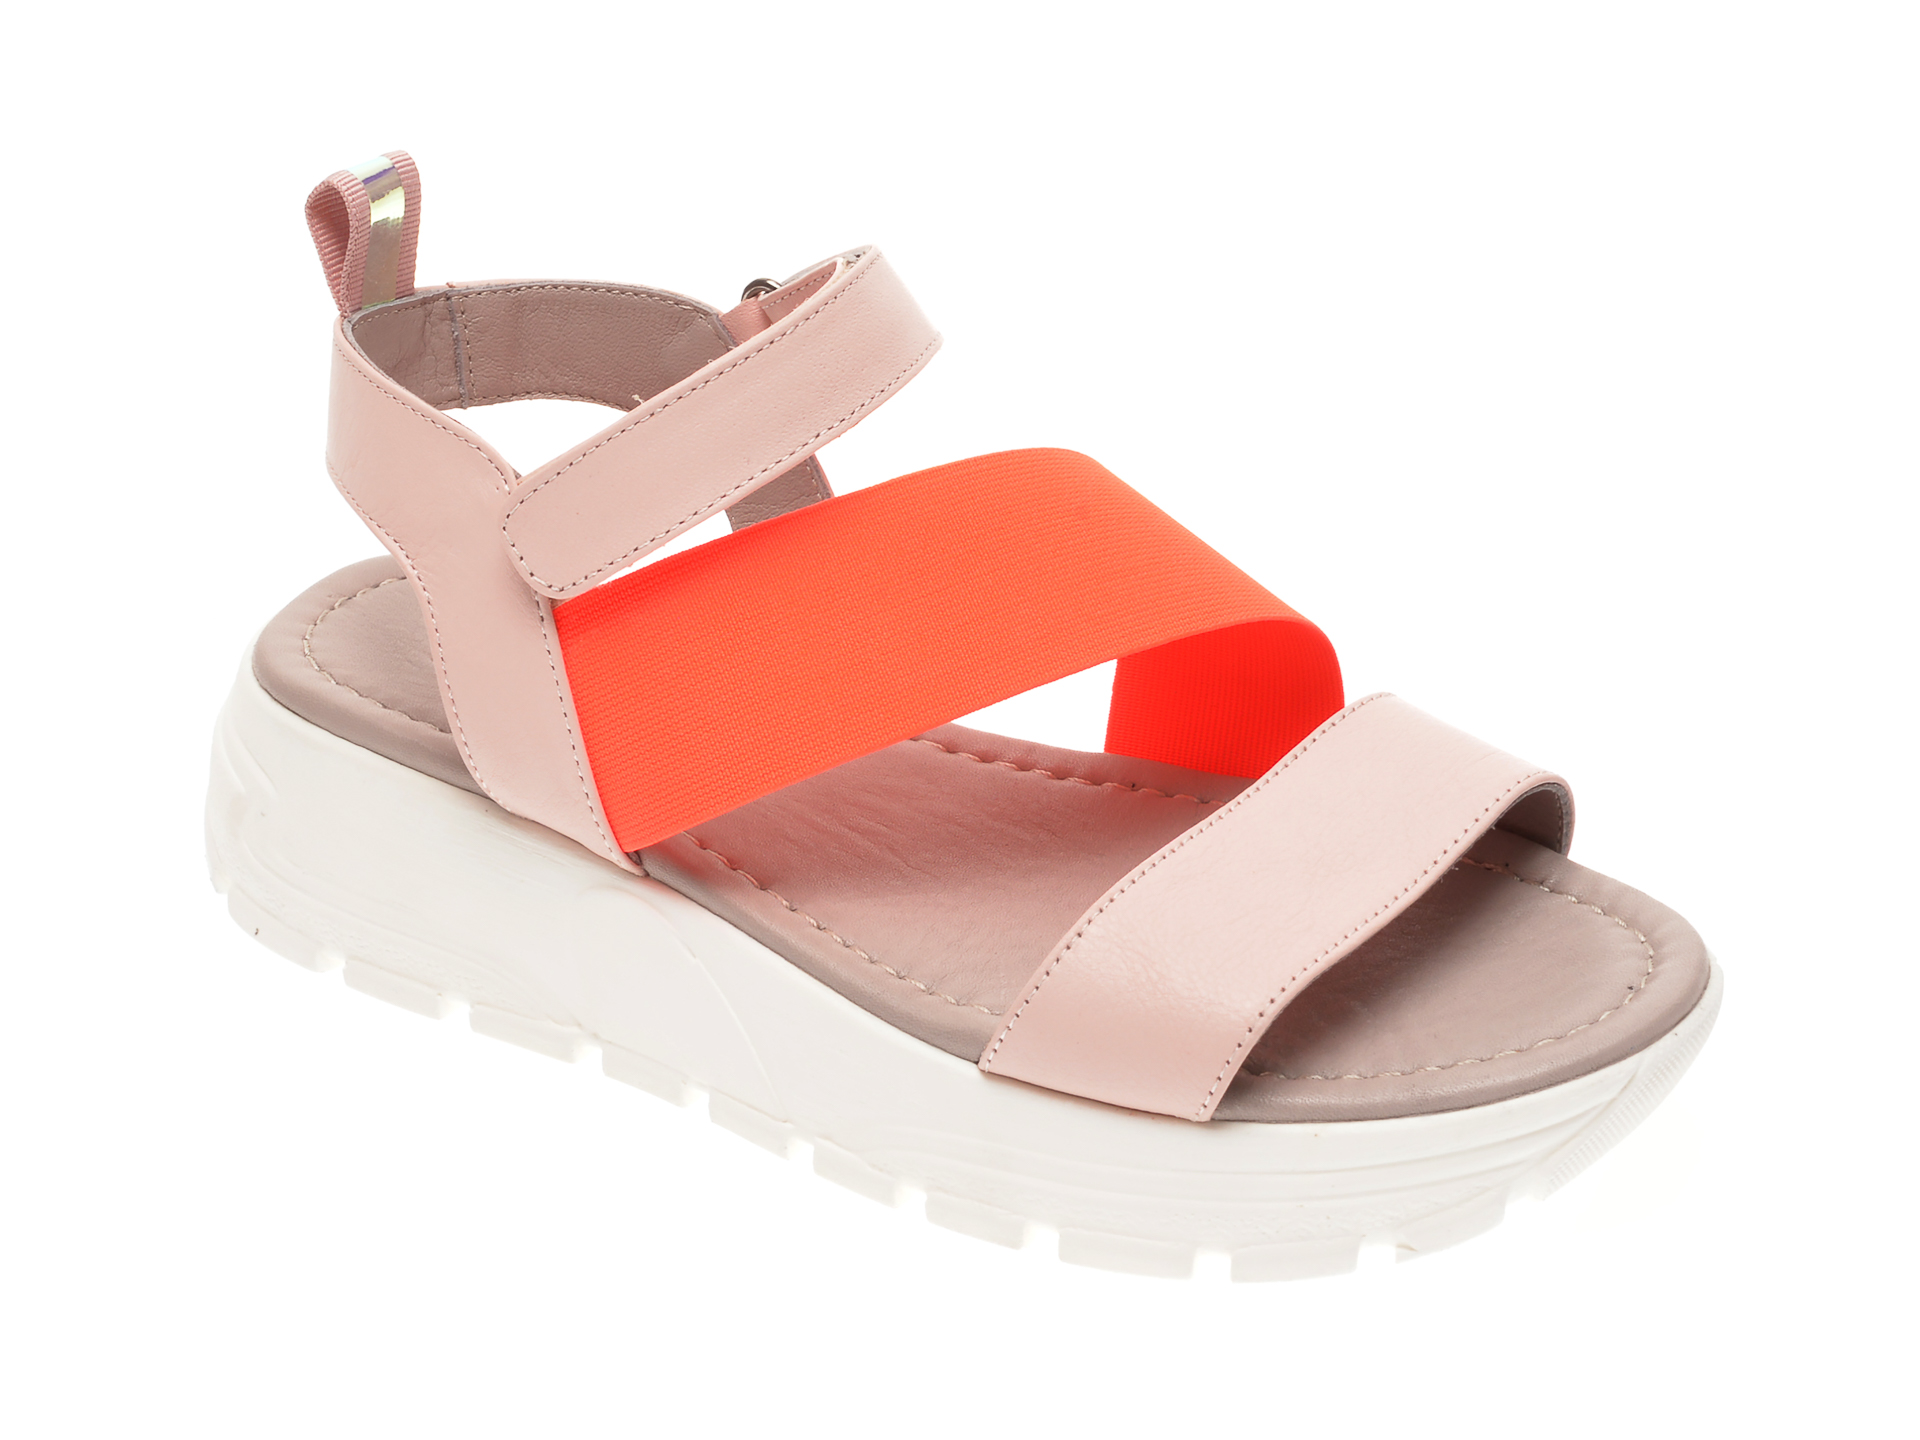 Sandale FLAVIA PASSINI nude, 0021671, din material textil si piele naturala